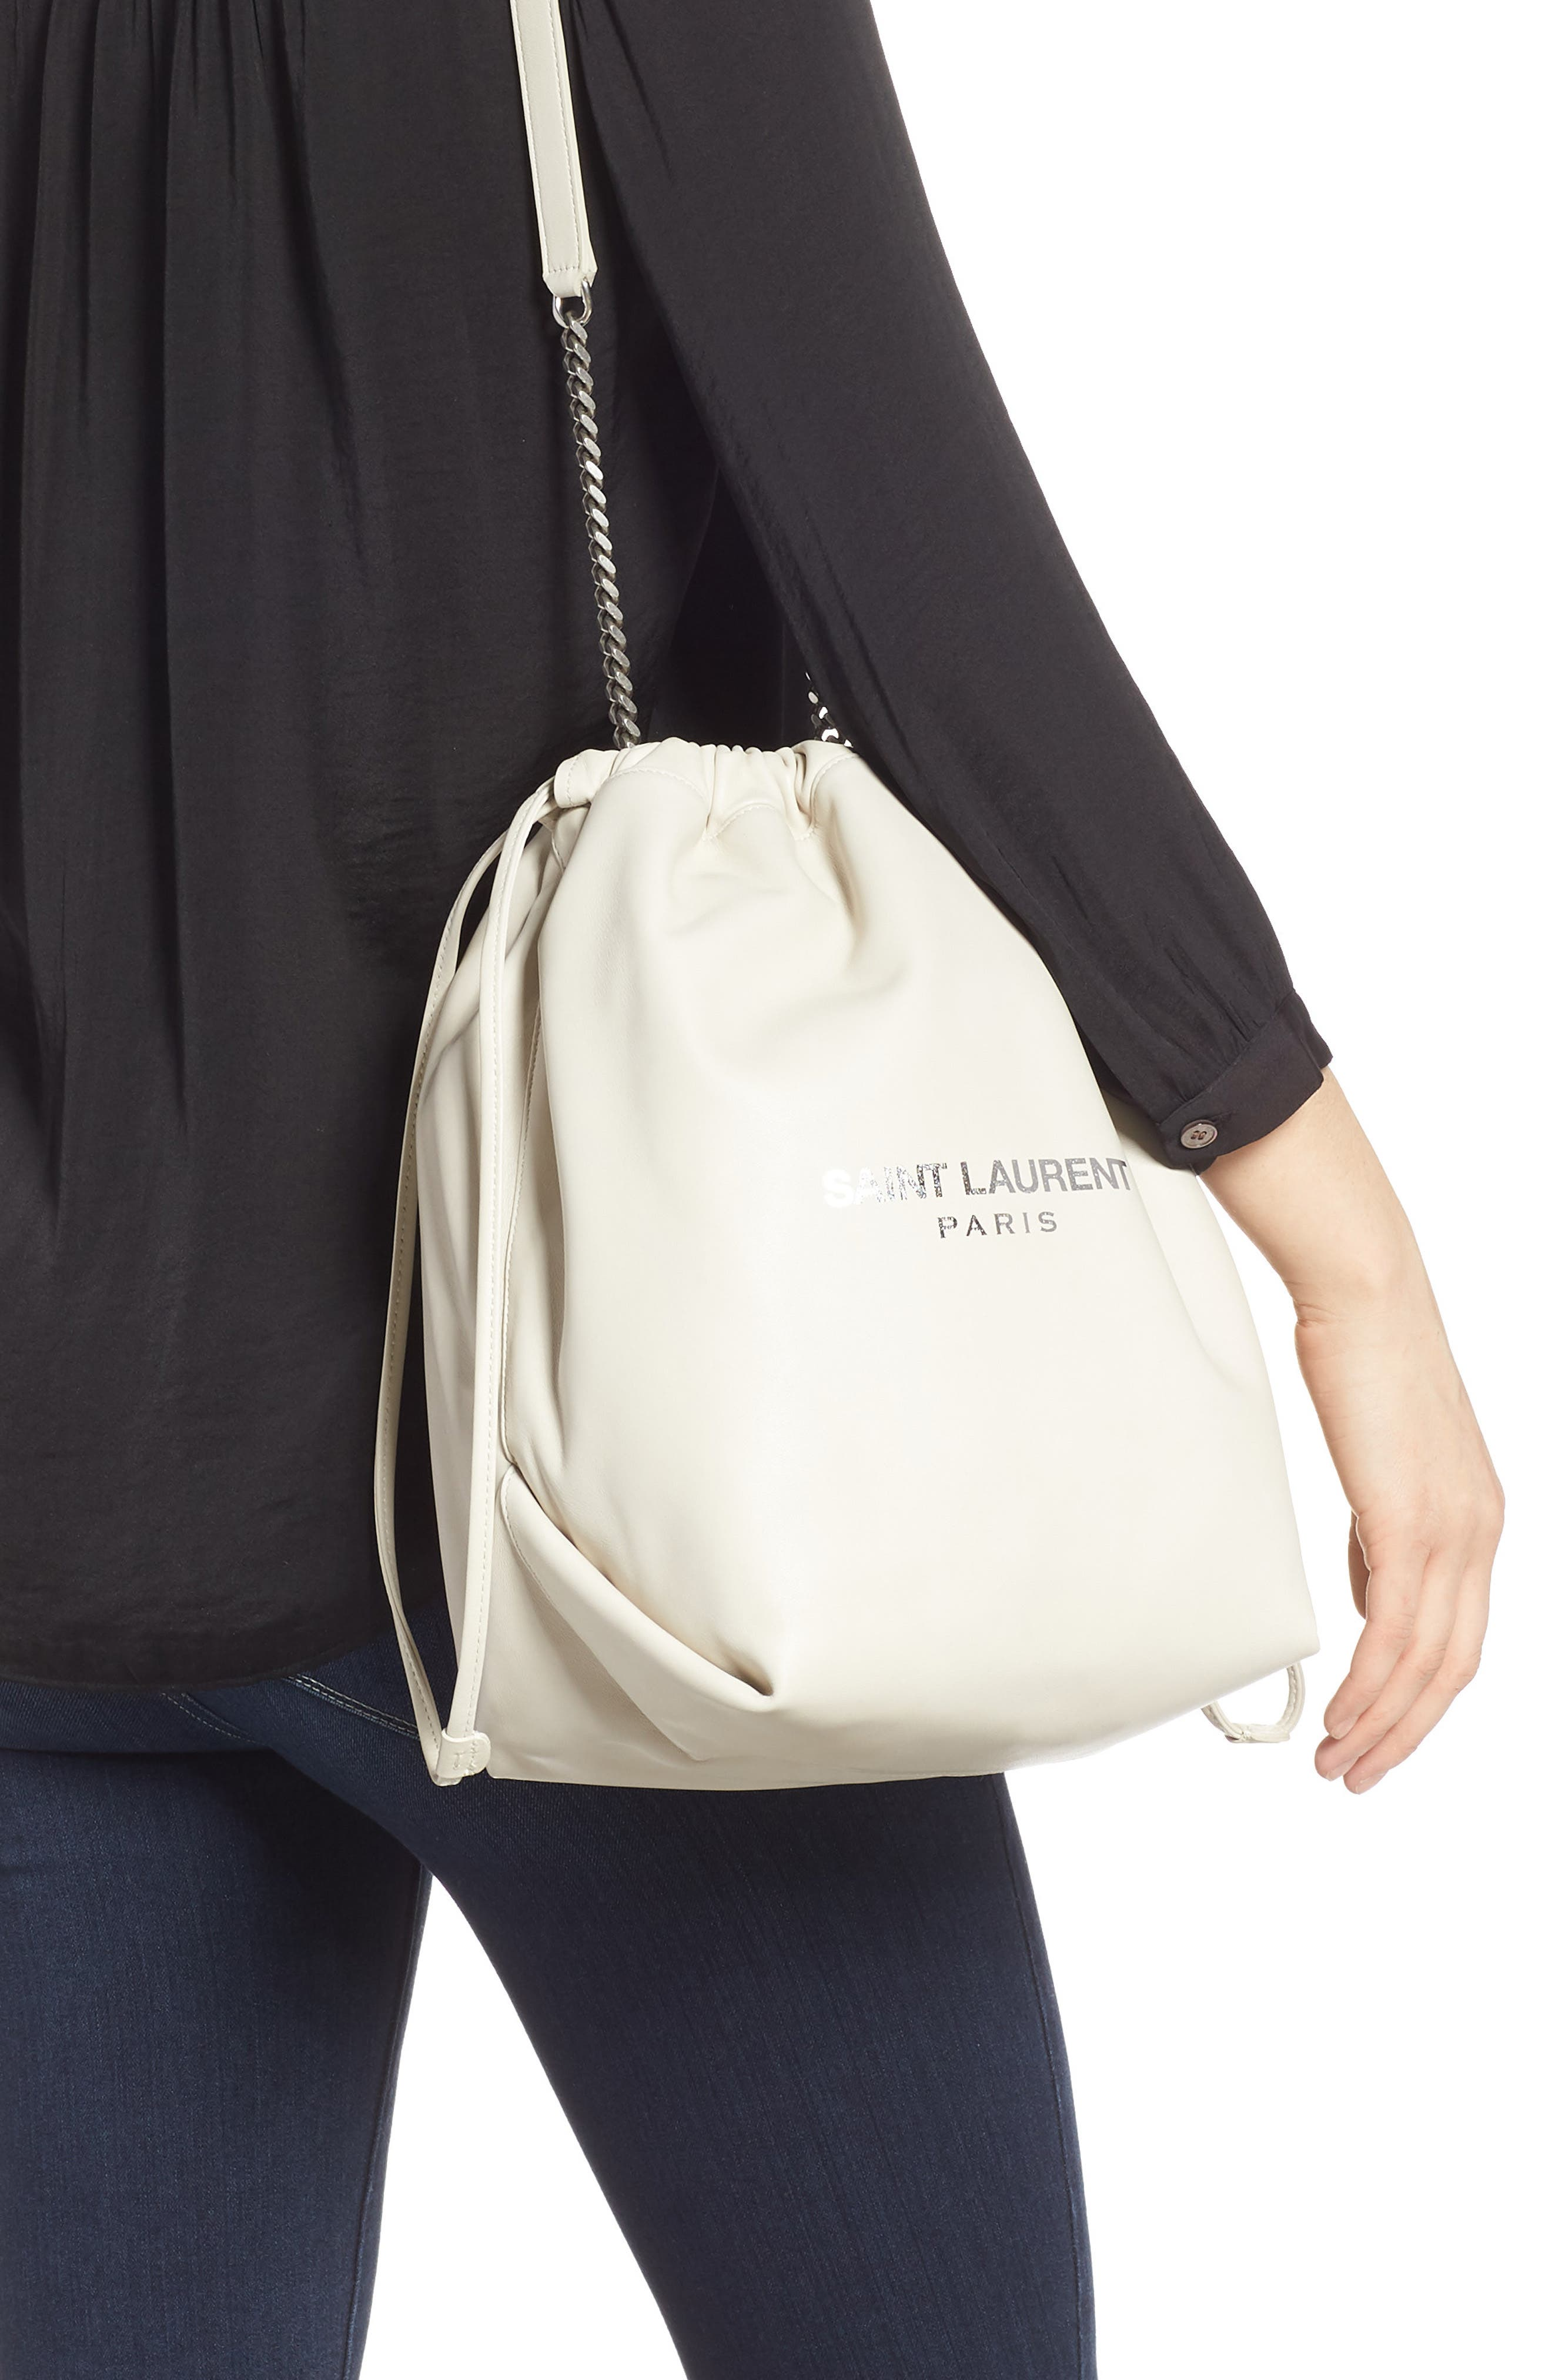 SAINT LAURENT,                             Teddy Leather Bucket Bag,                             Alternate thumbnail 2, color,                             CREMASOFT